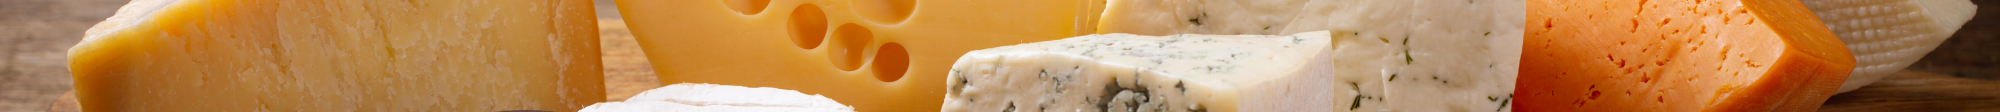 Comprar  quesos Semicurados gourmet online | Mixtura Gourmet